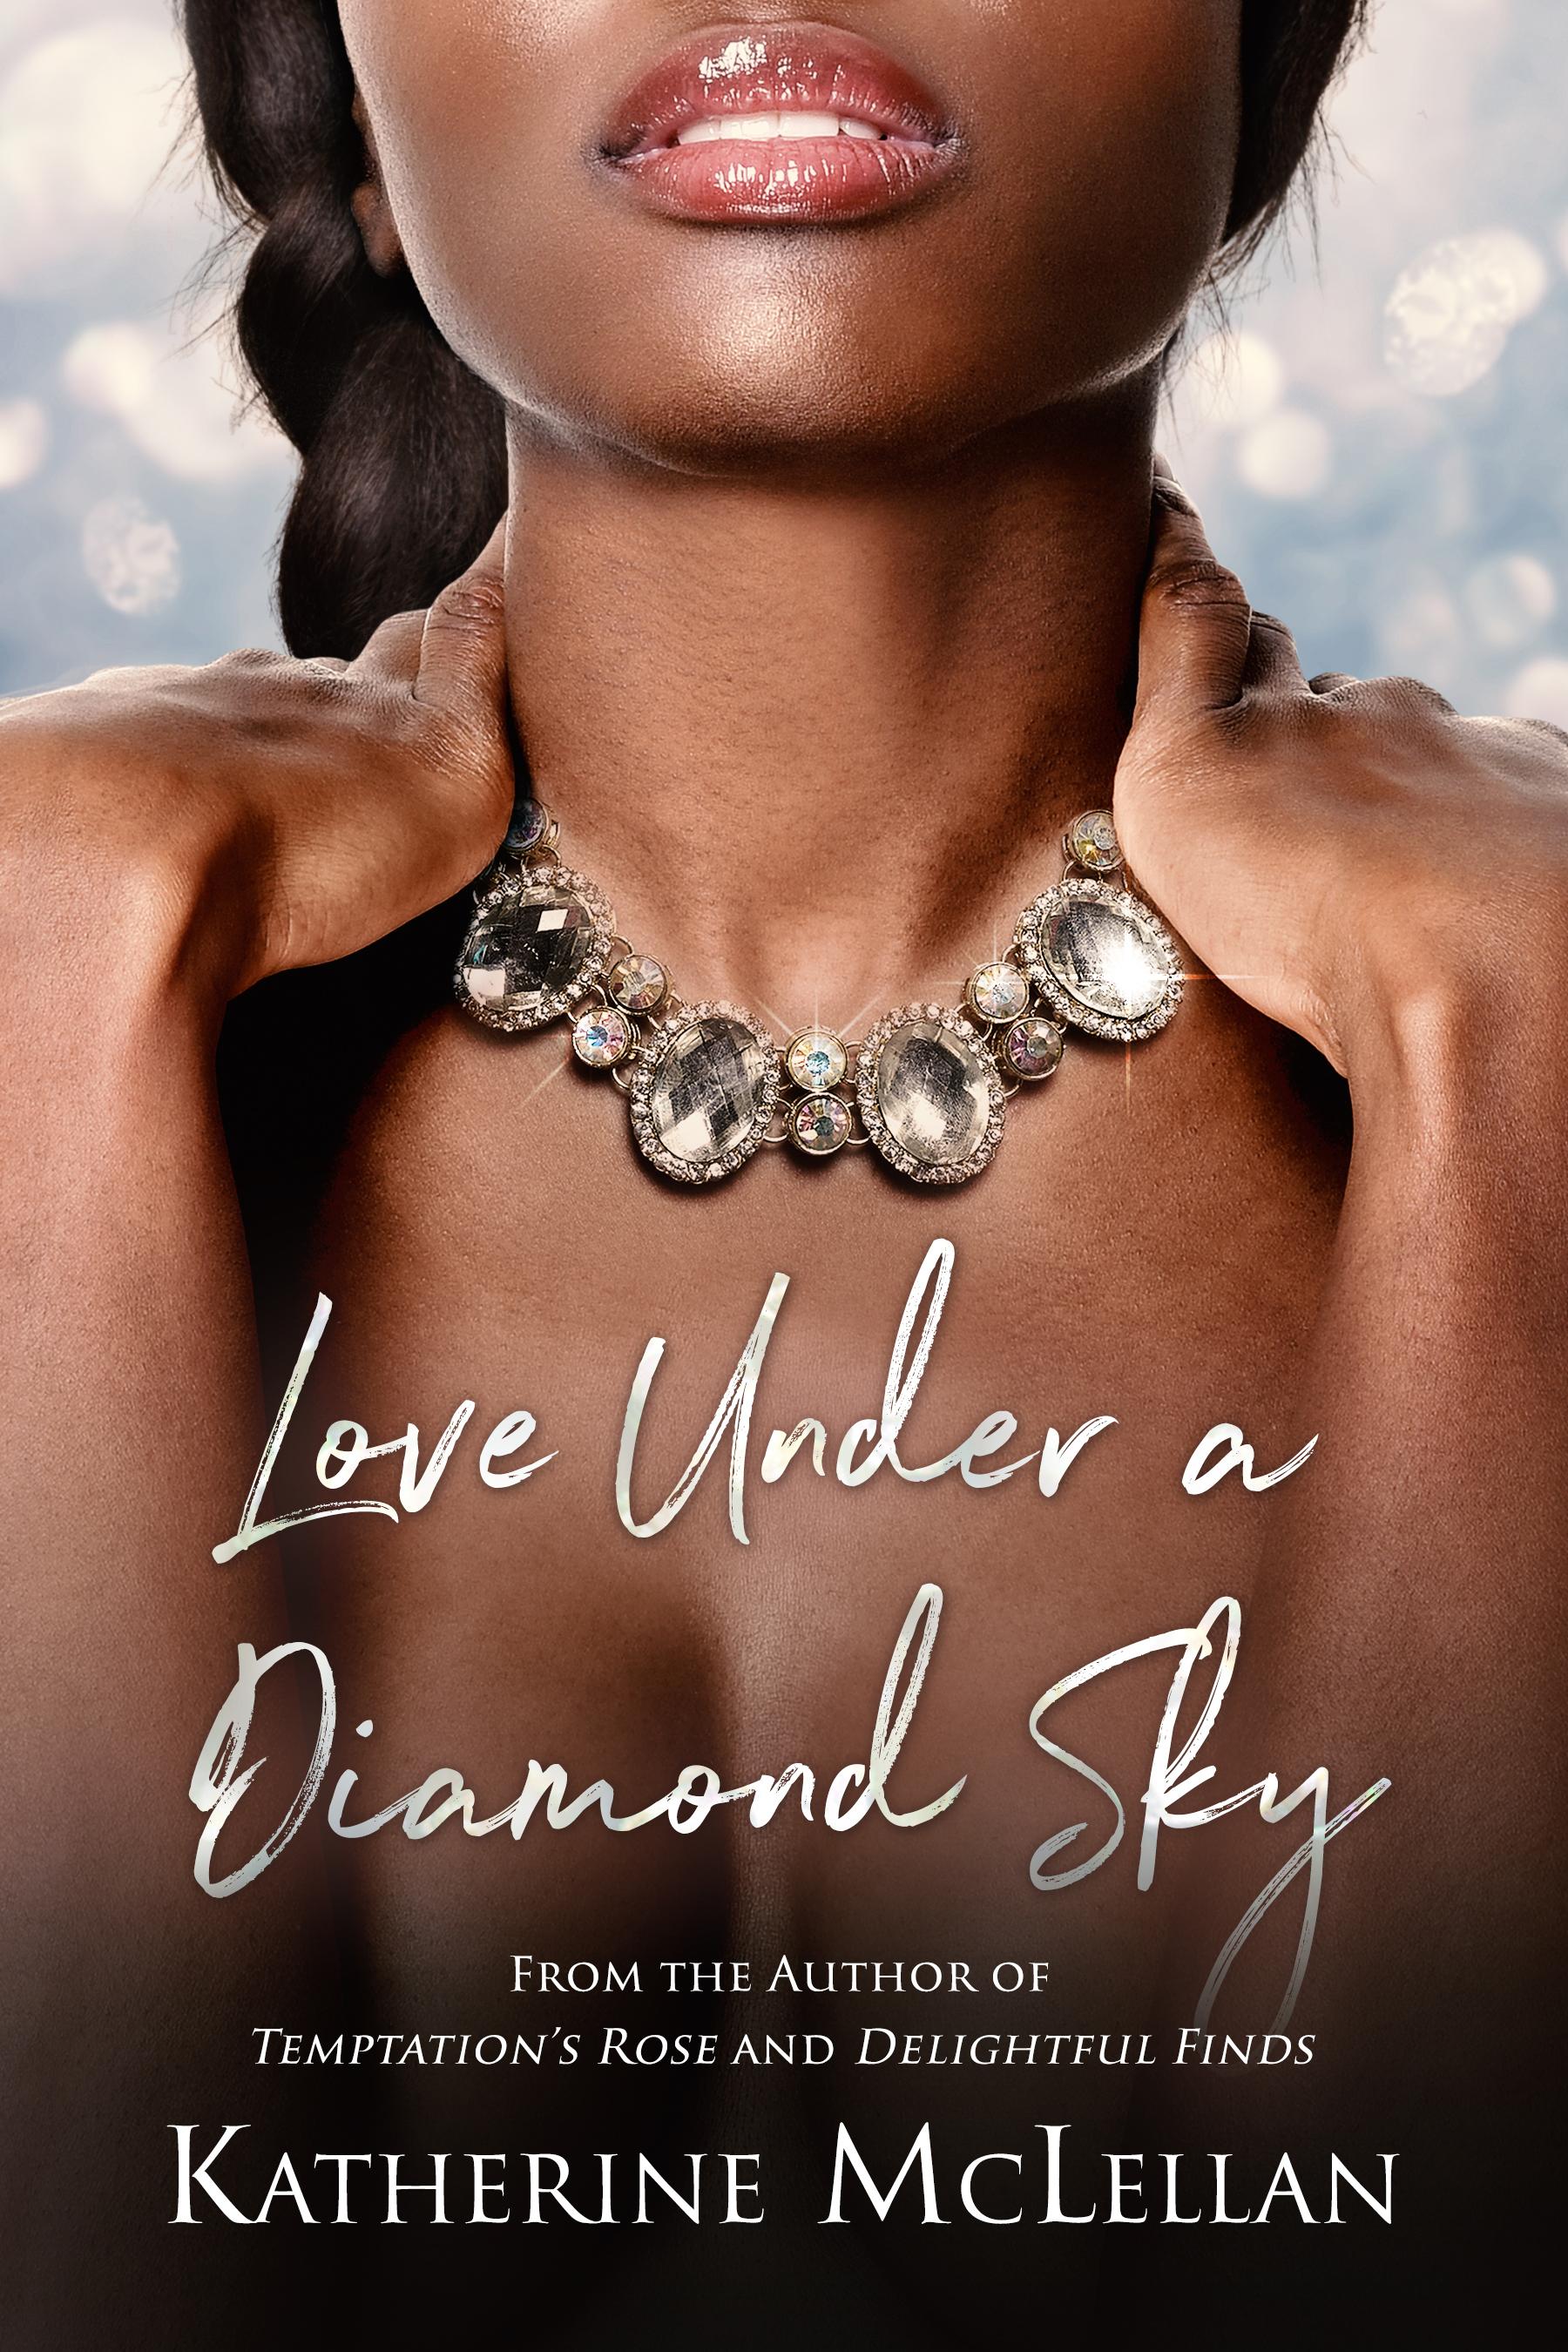 love-under-a-diamond-sky_6x9-2